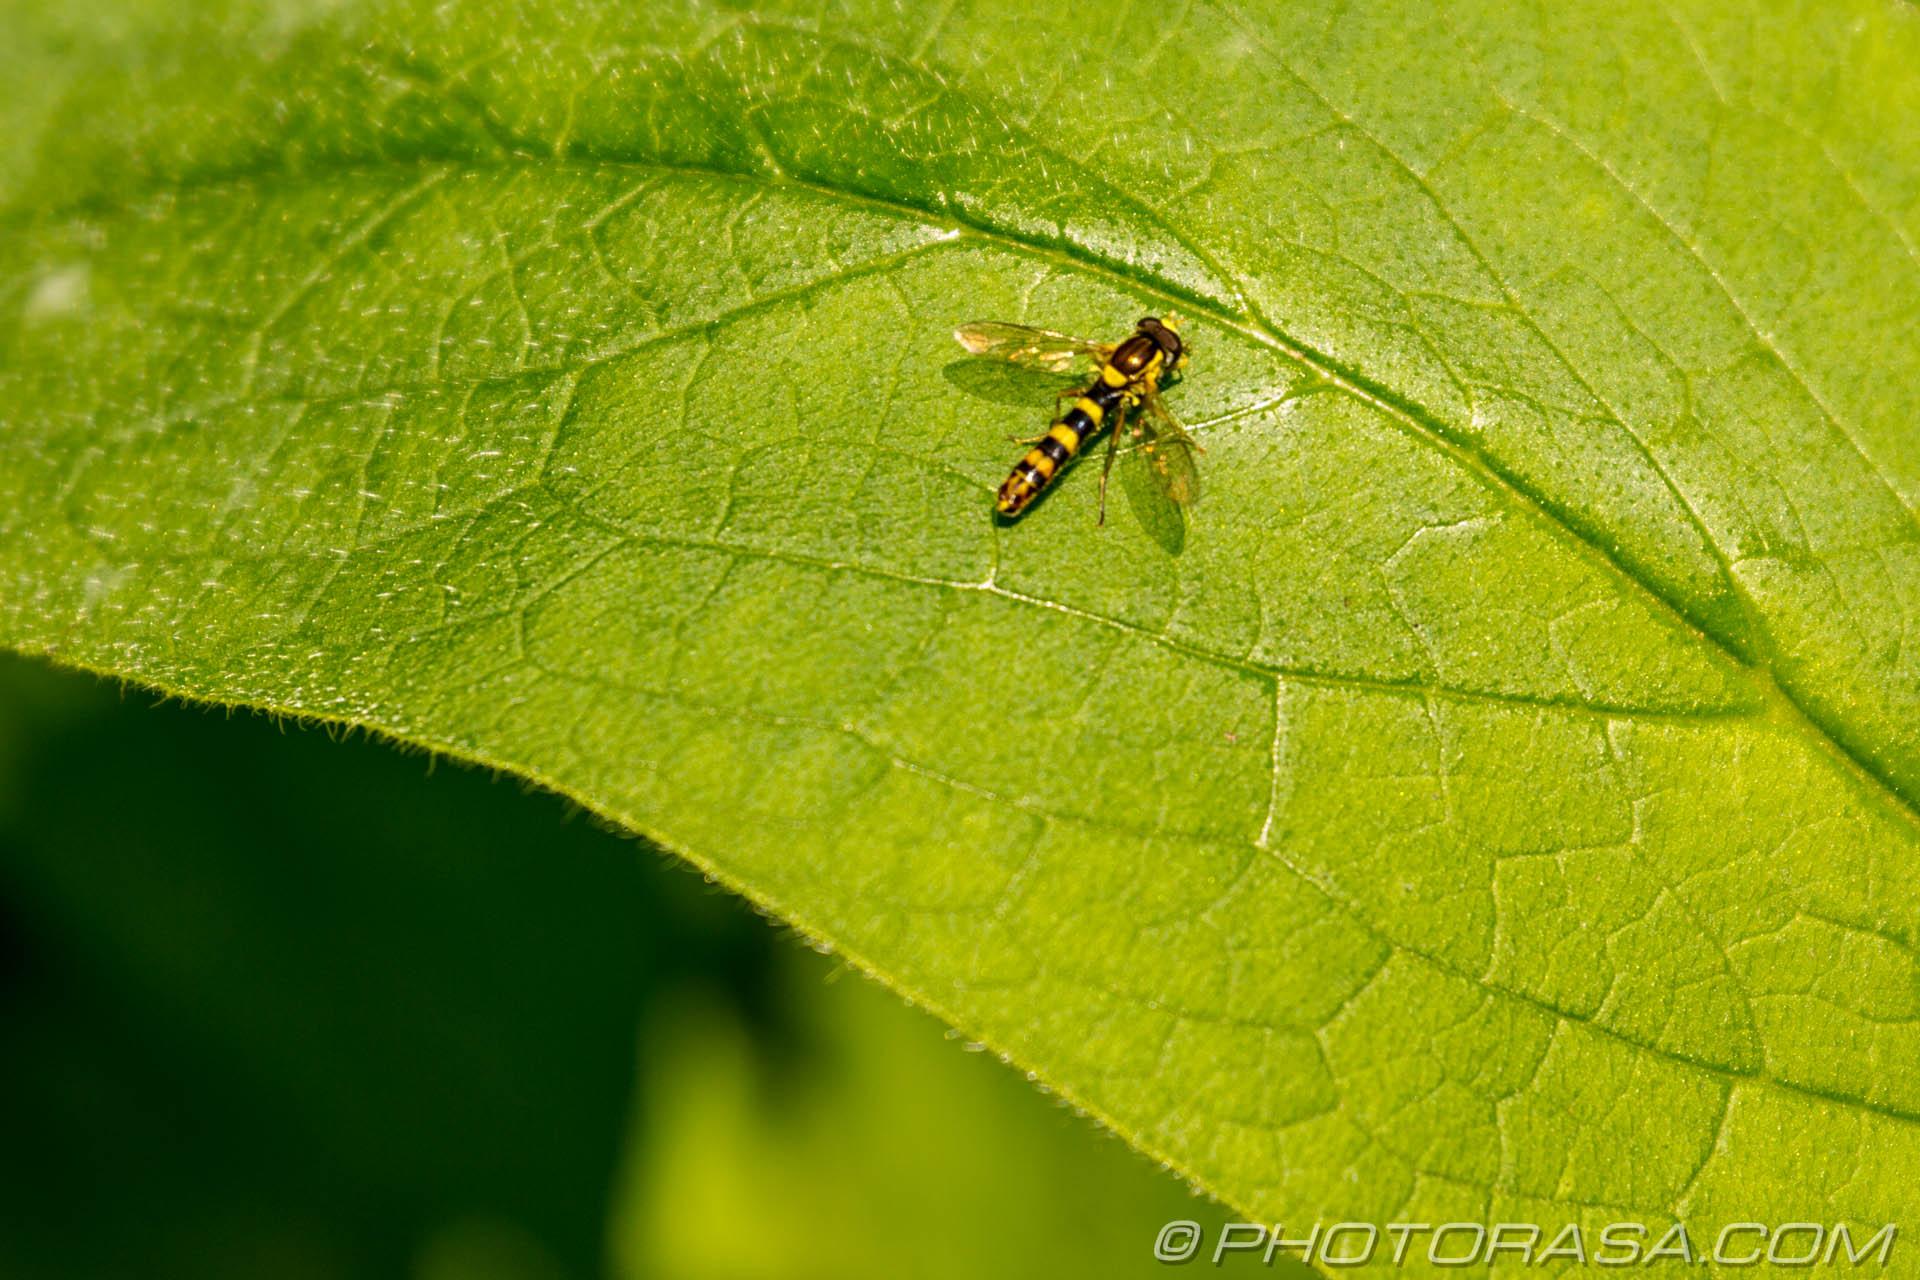 https://photorasa.com/hoverflies/hoverfly-on-leaf/